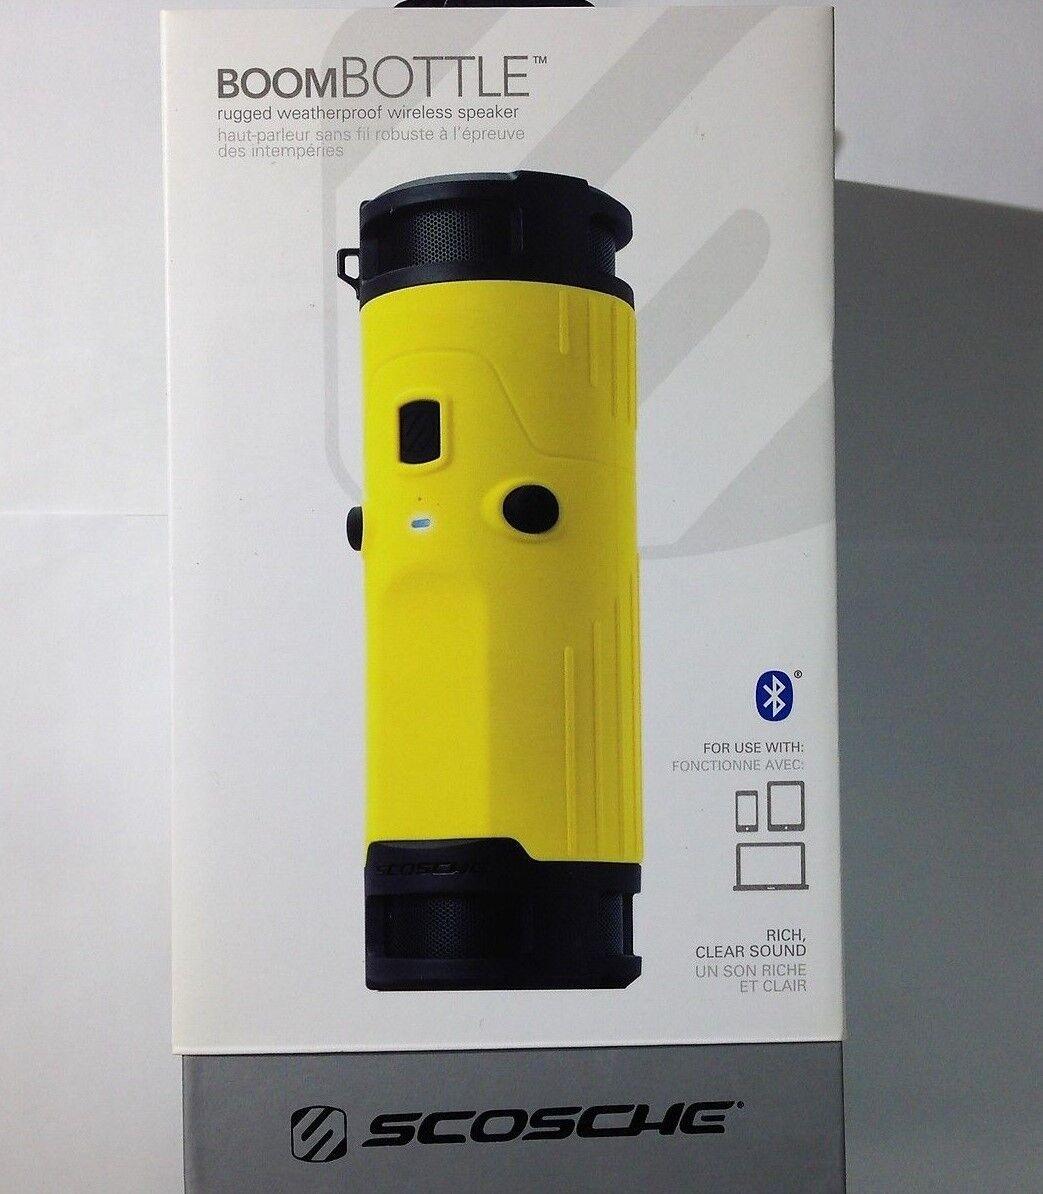 Boom Bottle Scosche BoomBottle  Bluetooth Weatherproof Wireless Rugged Speaker